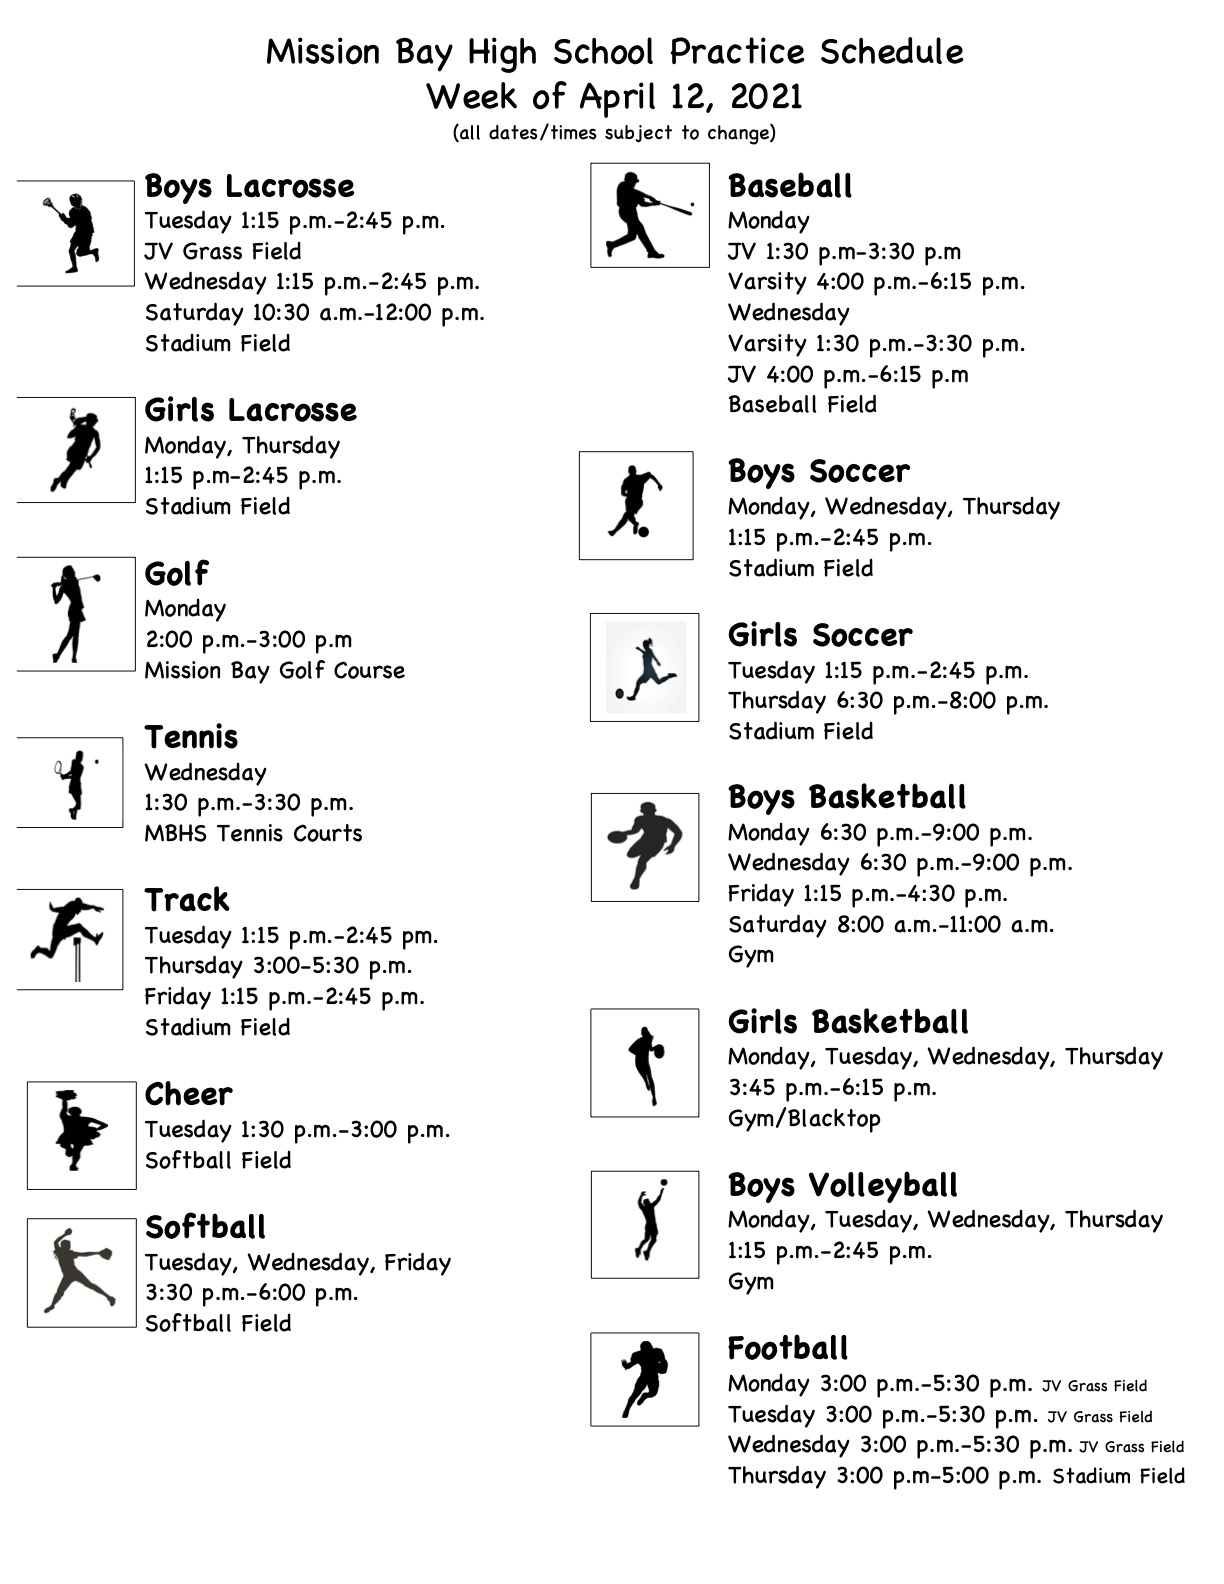 Practice Schedule for Week of April 12